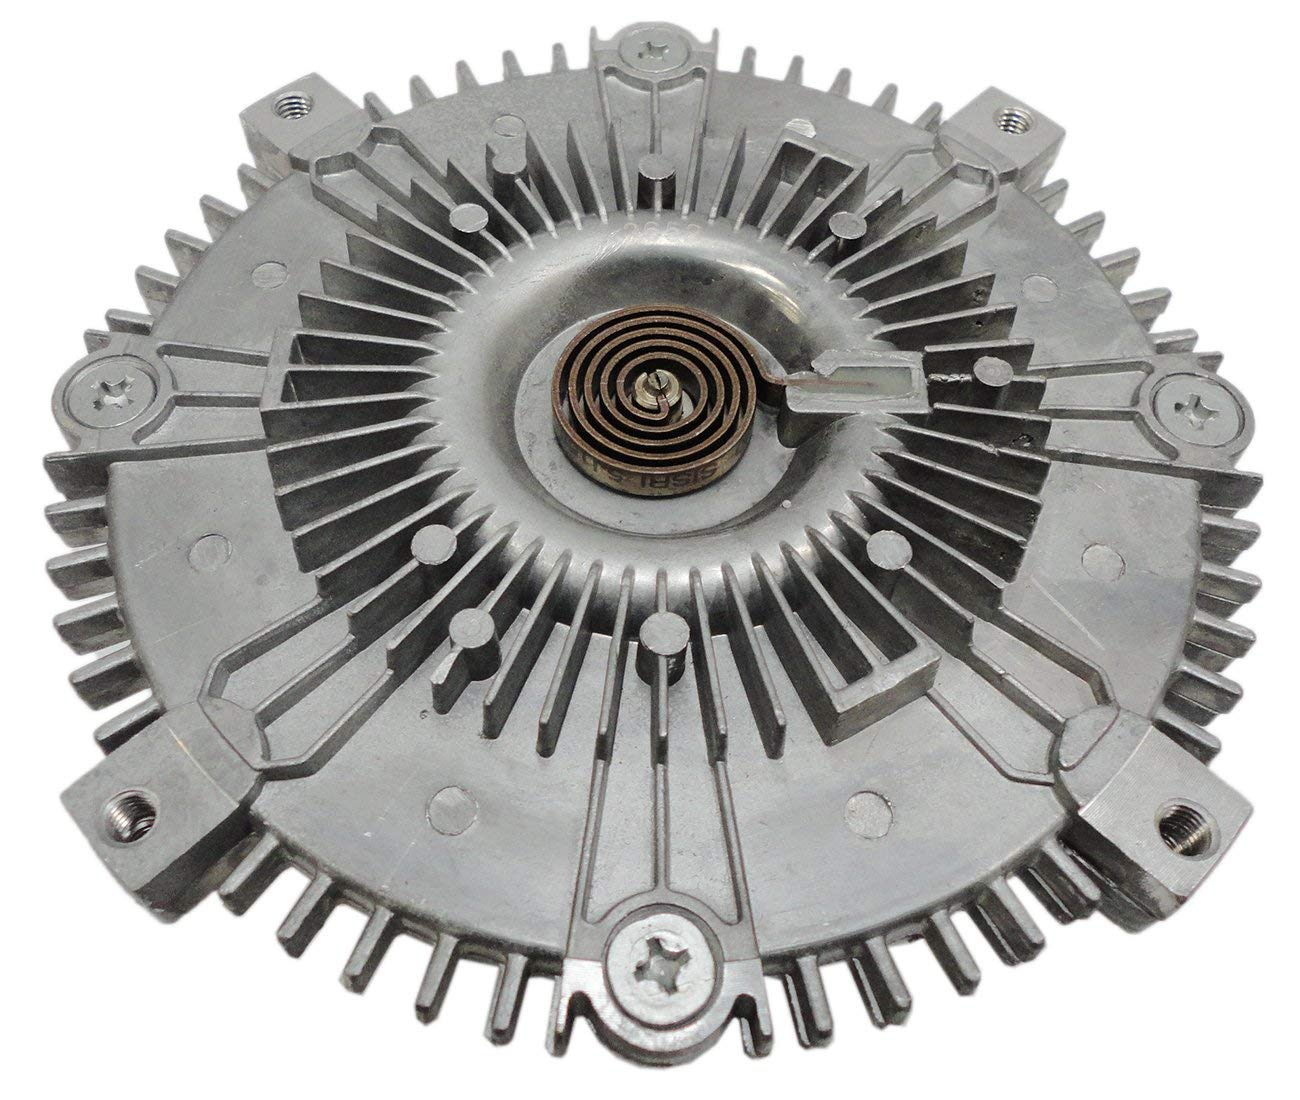 TOPAZ 2652 Engine Cooling Fan Clutch for 89-93 Mazda B2600 MPV Truck 2.6L L4